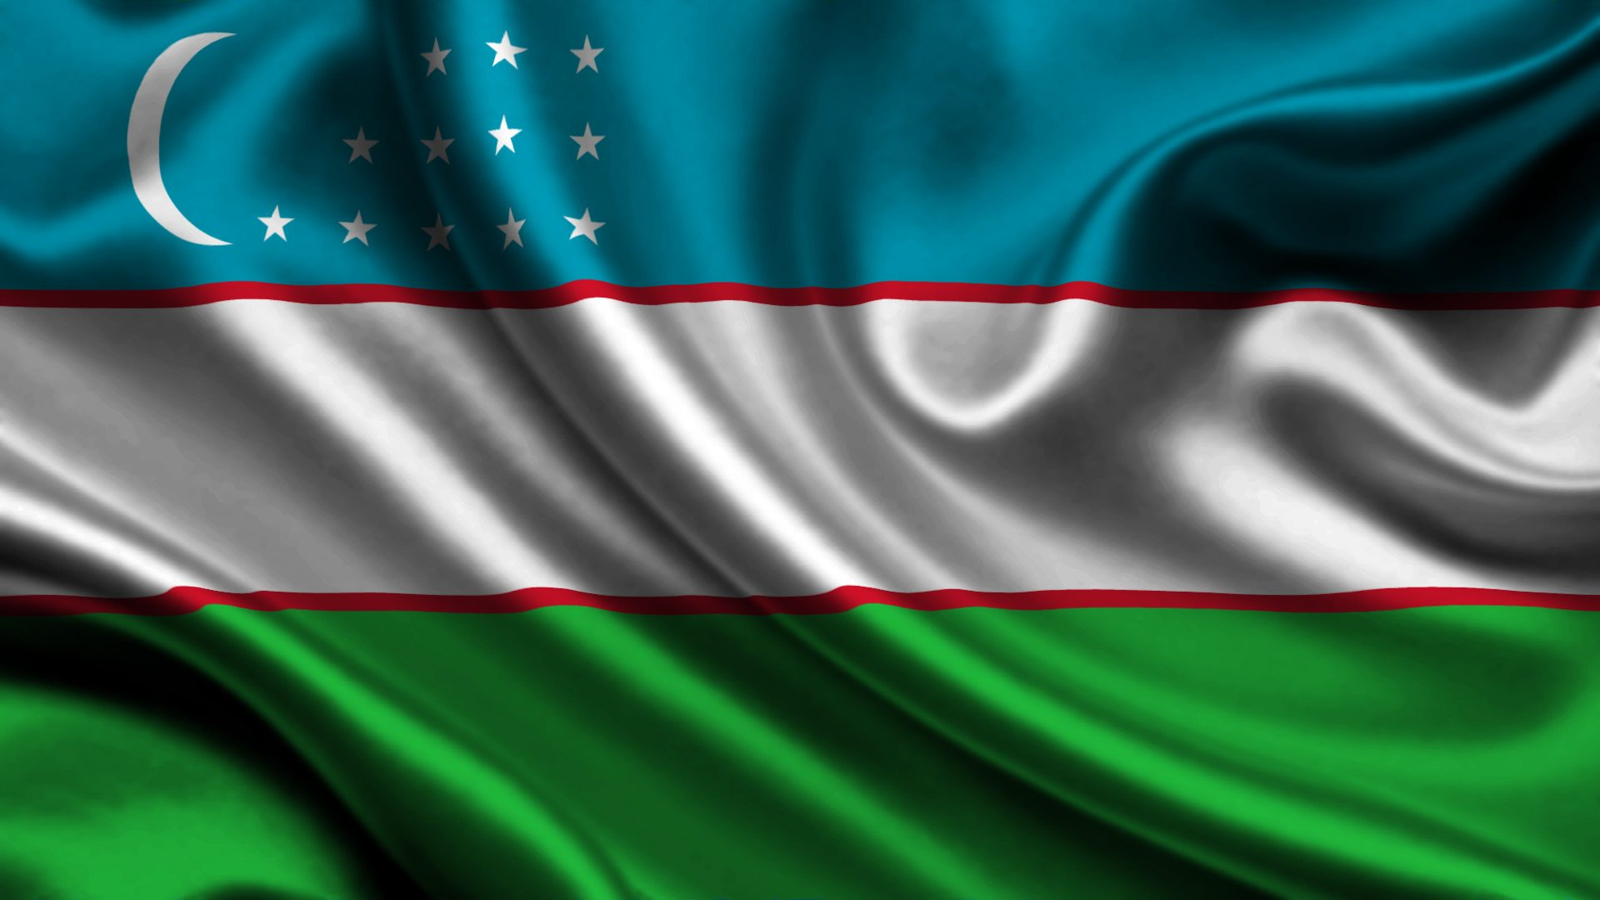 Узбекистан - соучредитель Азиатского банка инфраструктурных инвестиций